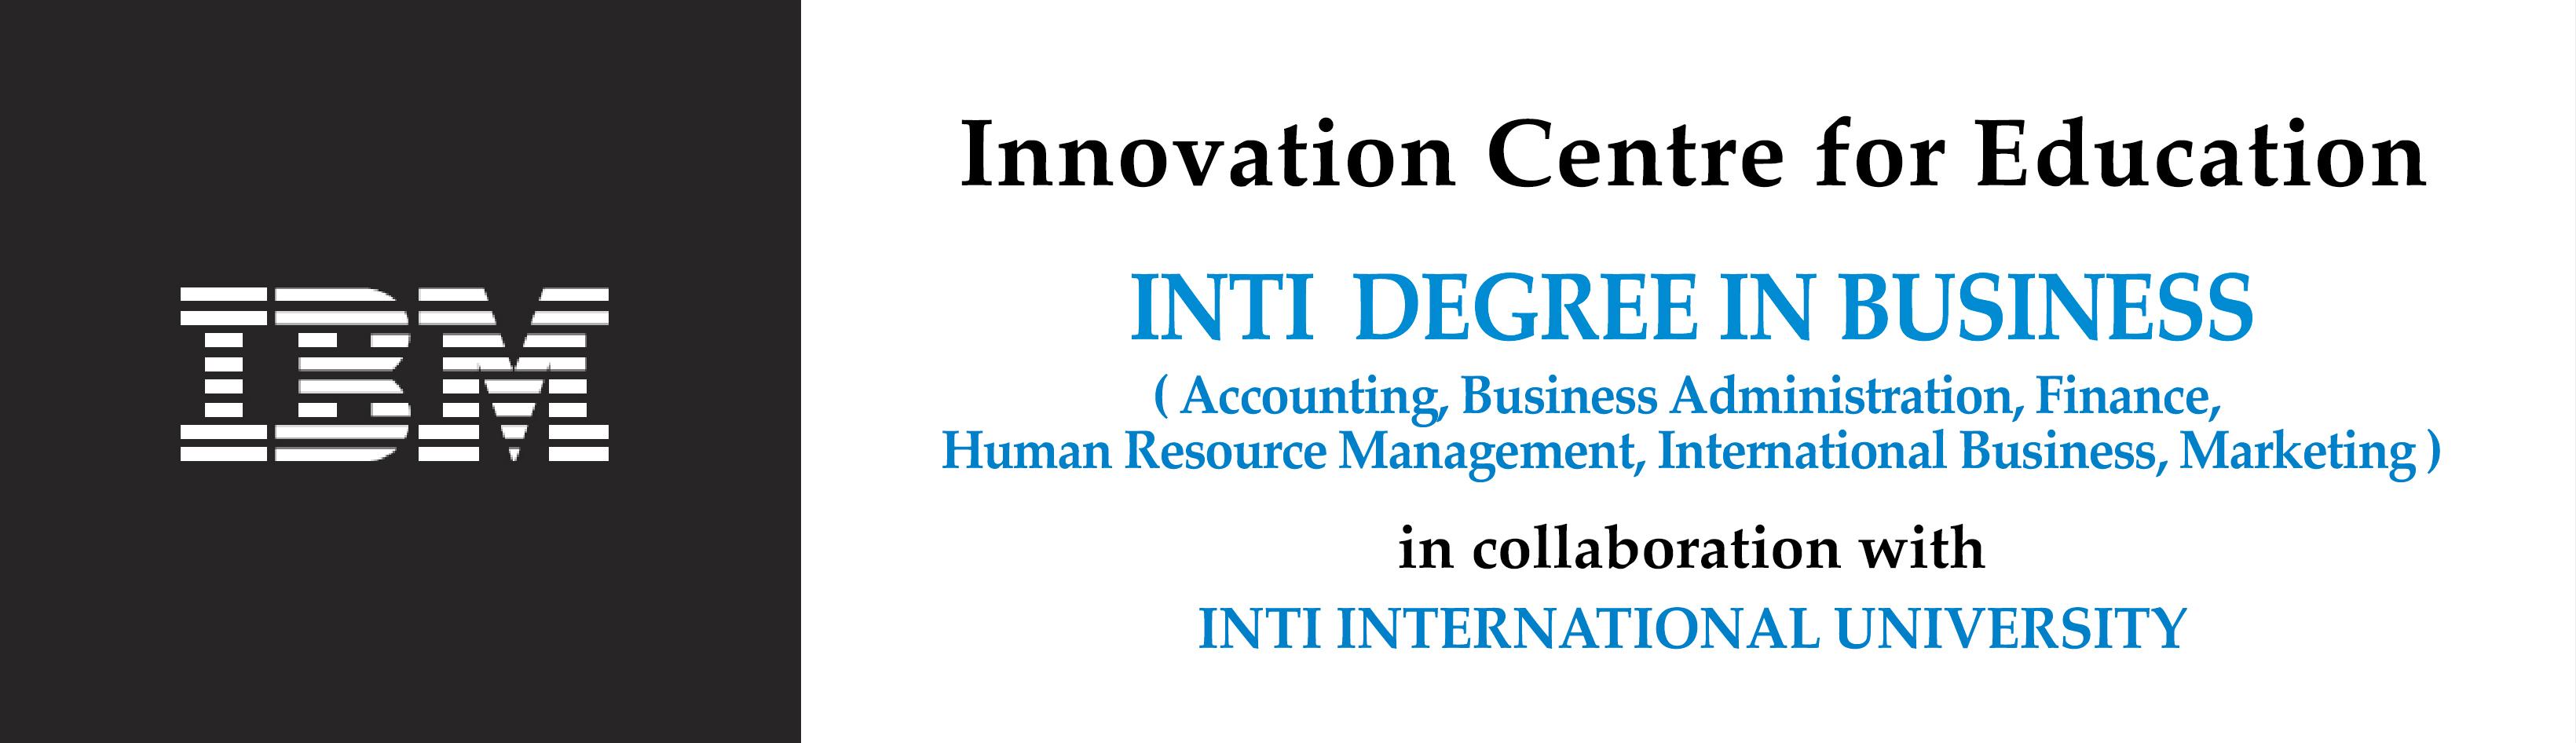 IBM Innovation Centre for Education (IBM-ICE)